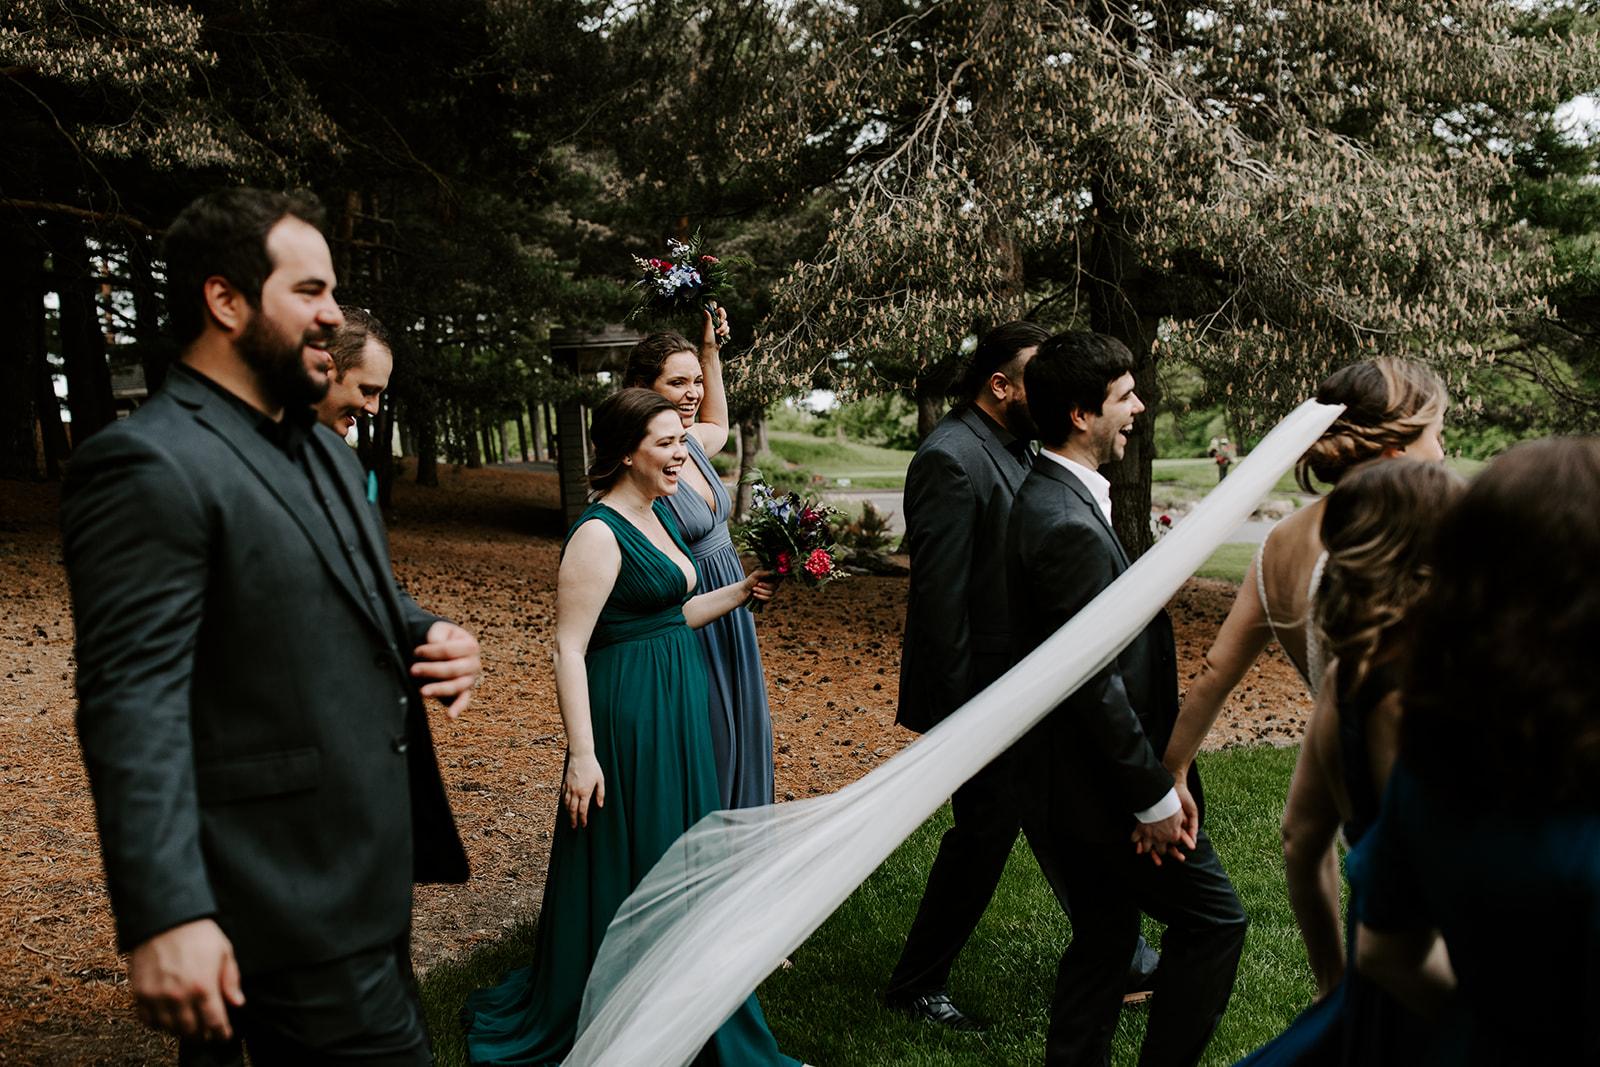 2019-06-01-00-Lindsey+Mat-05_Wedding_Party-meandhimphoto-0090-K5D45011.jpg